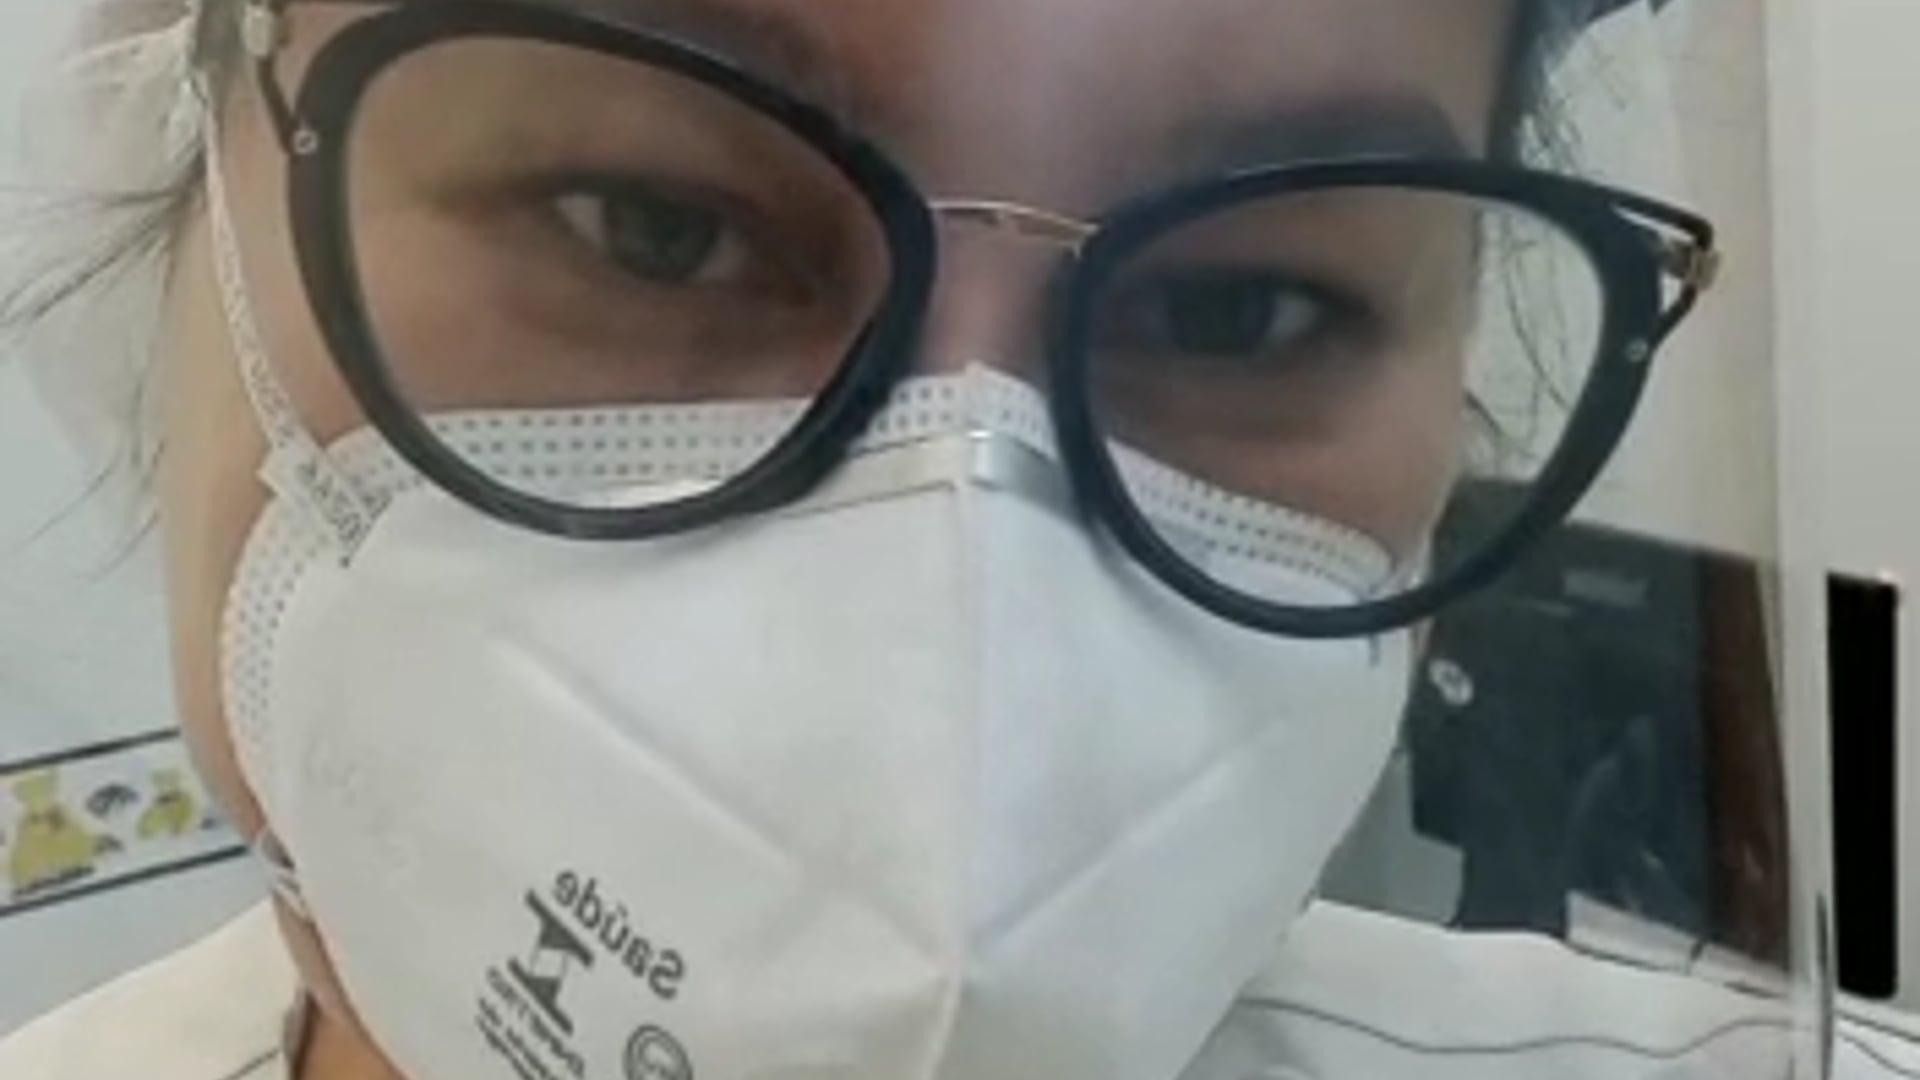 Dra. Lara Cássia macagnan Rocha Moreira